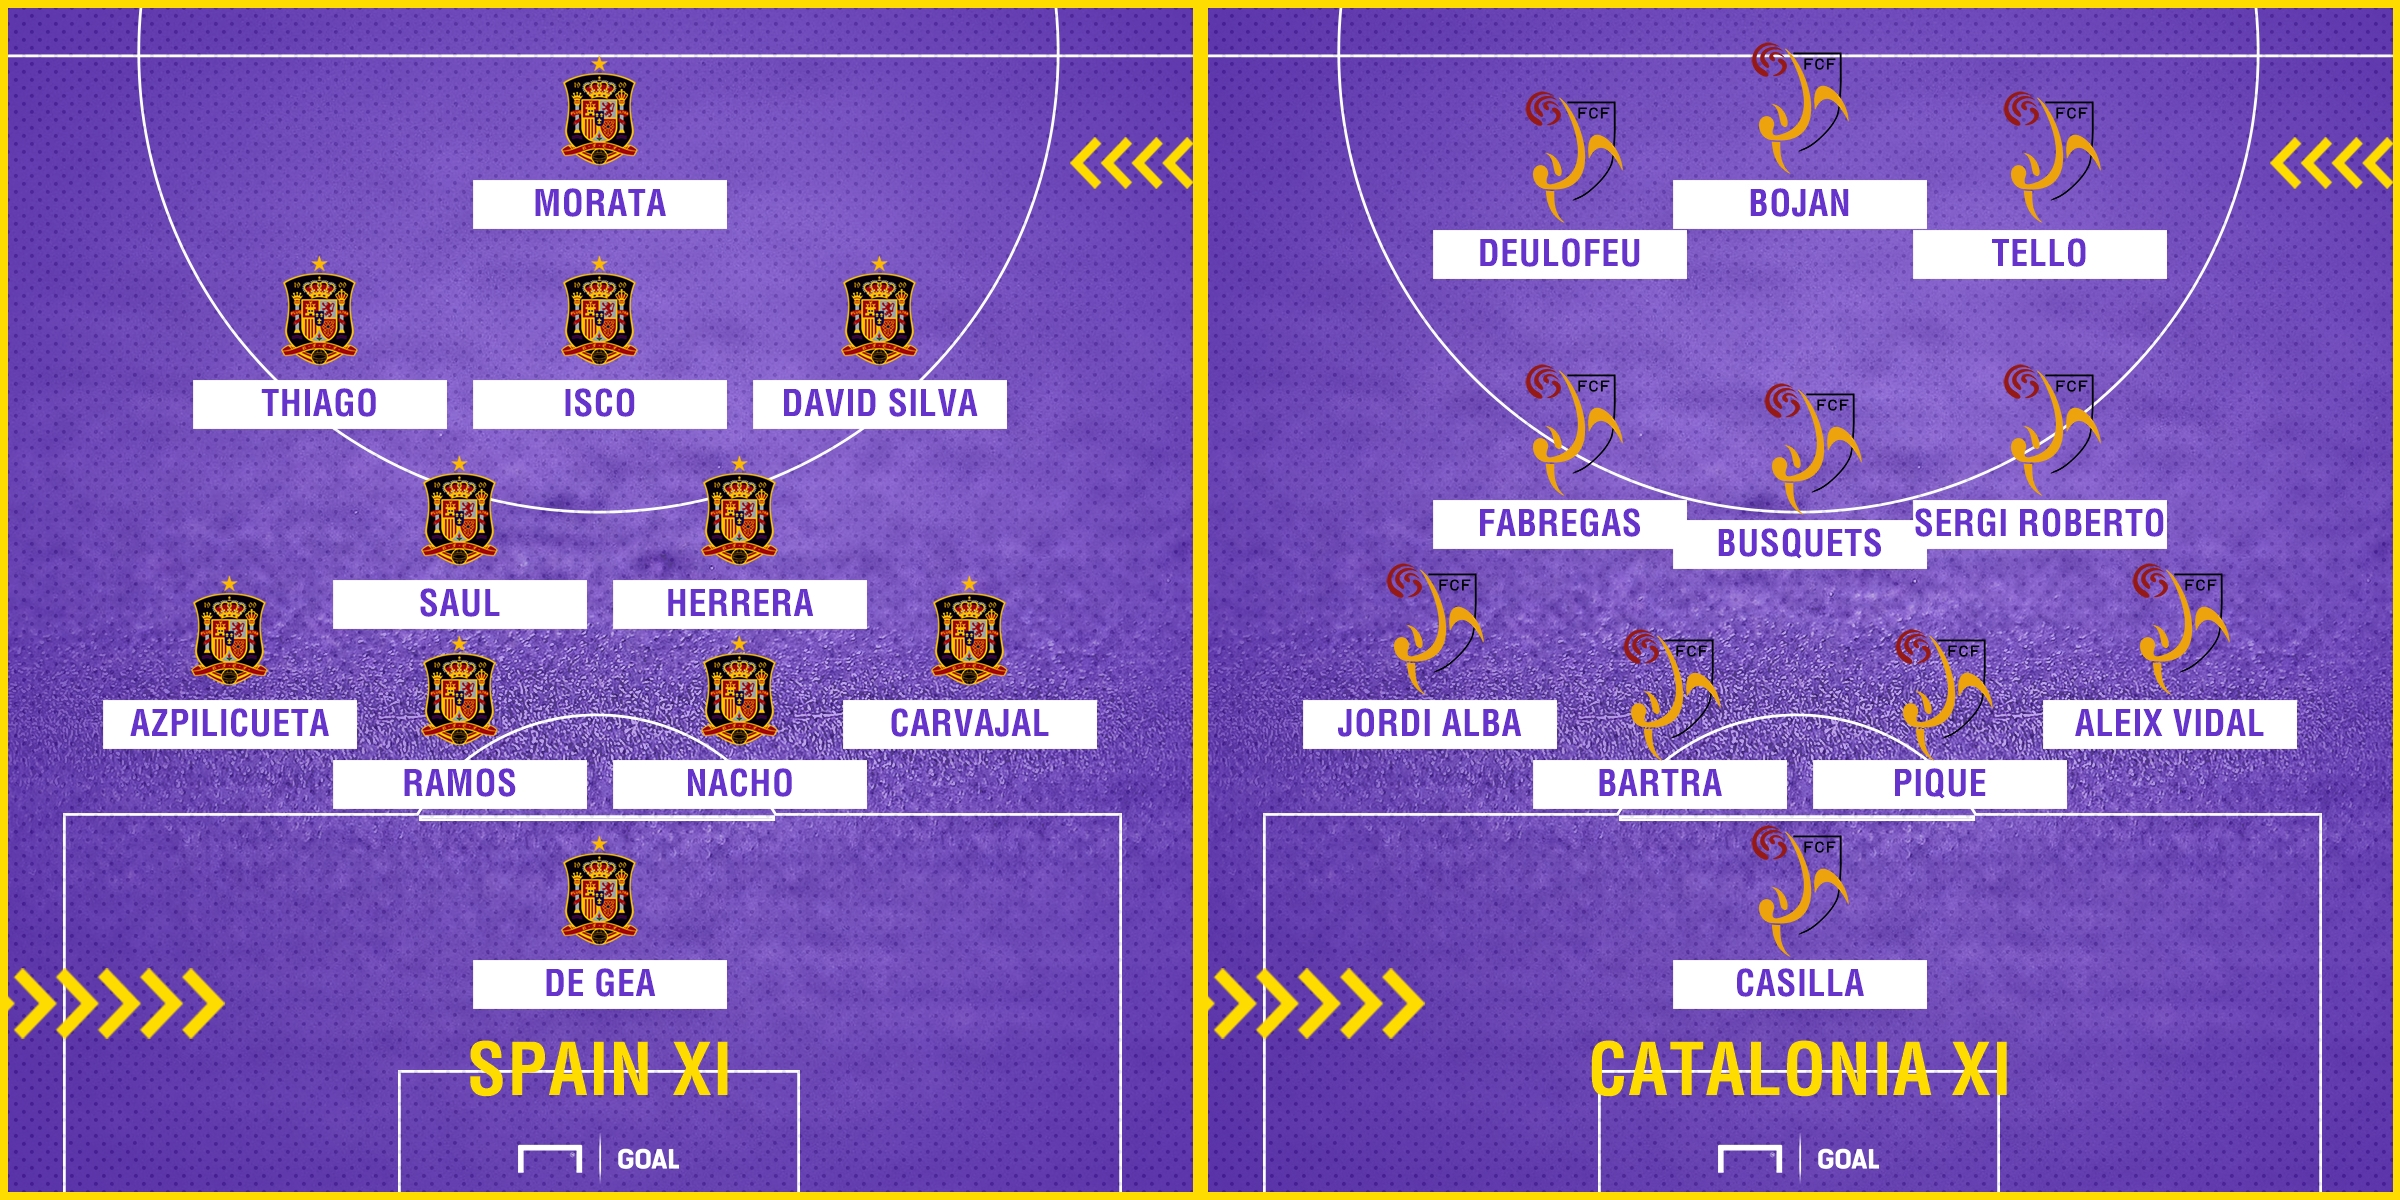 Spain vs Catalunya GFX